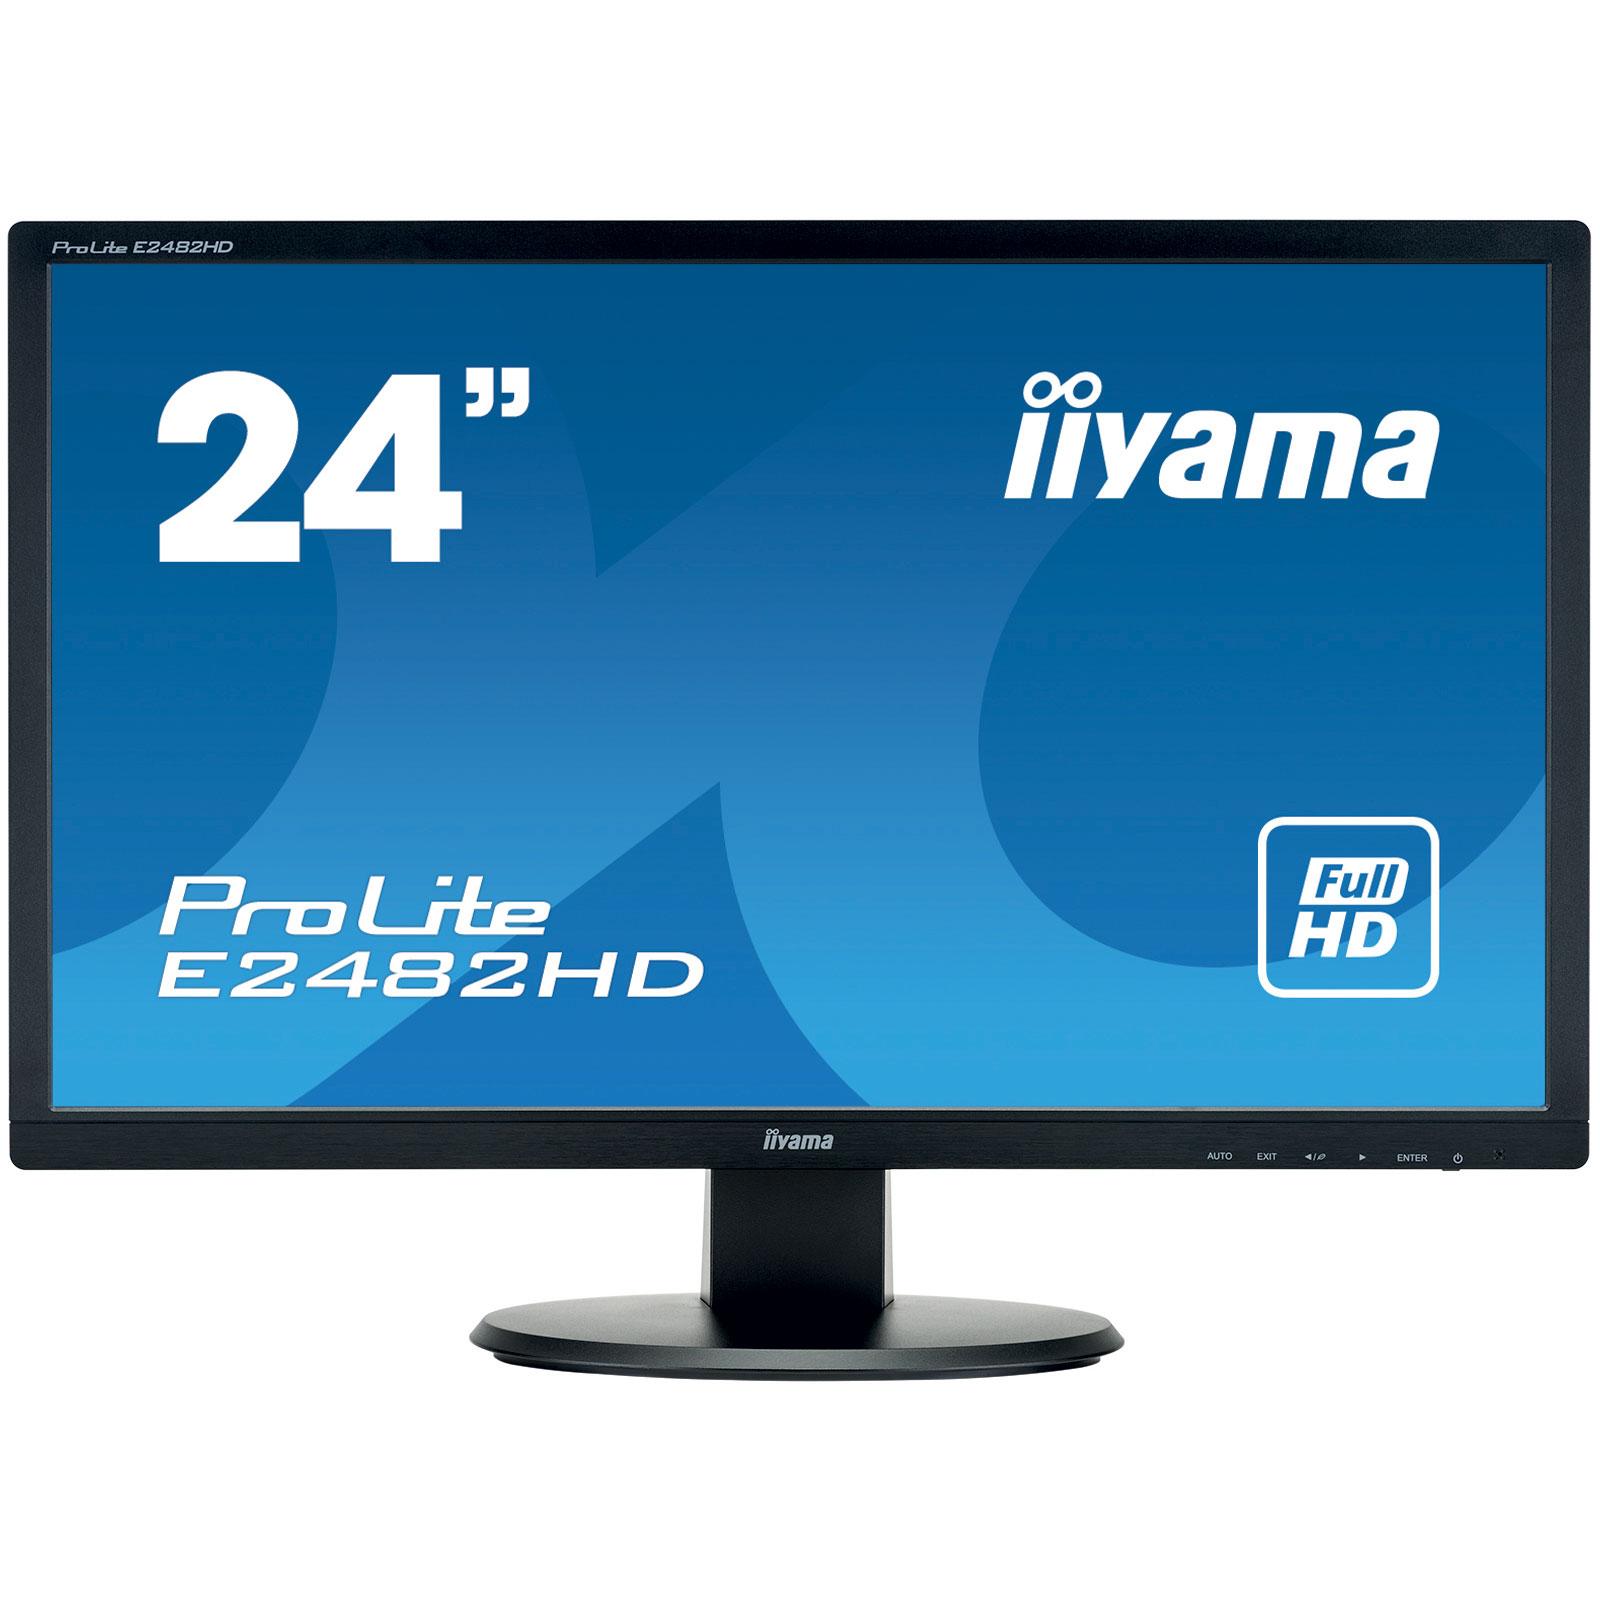 iiyama 24 led prolite e2482hd b1 ecran pc iiyama sur. Black Bedroom Furniture Sets. Home Design Ideas